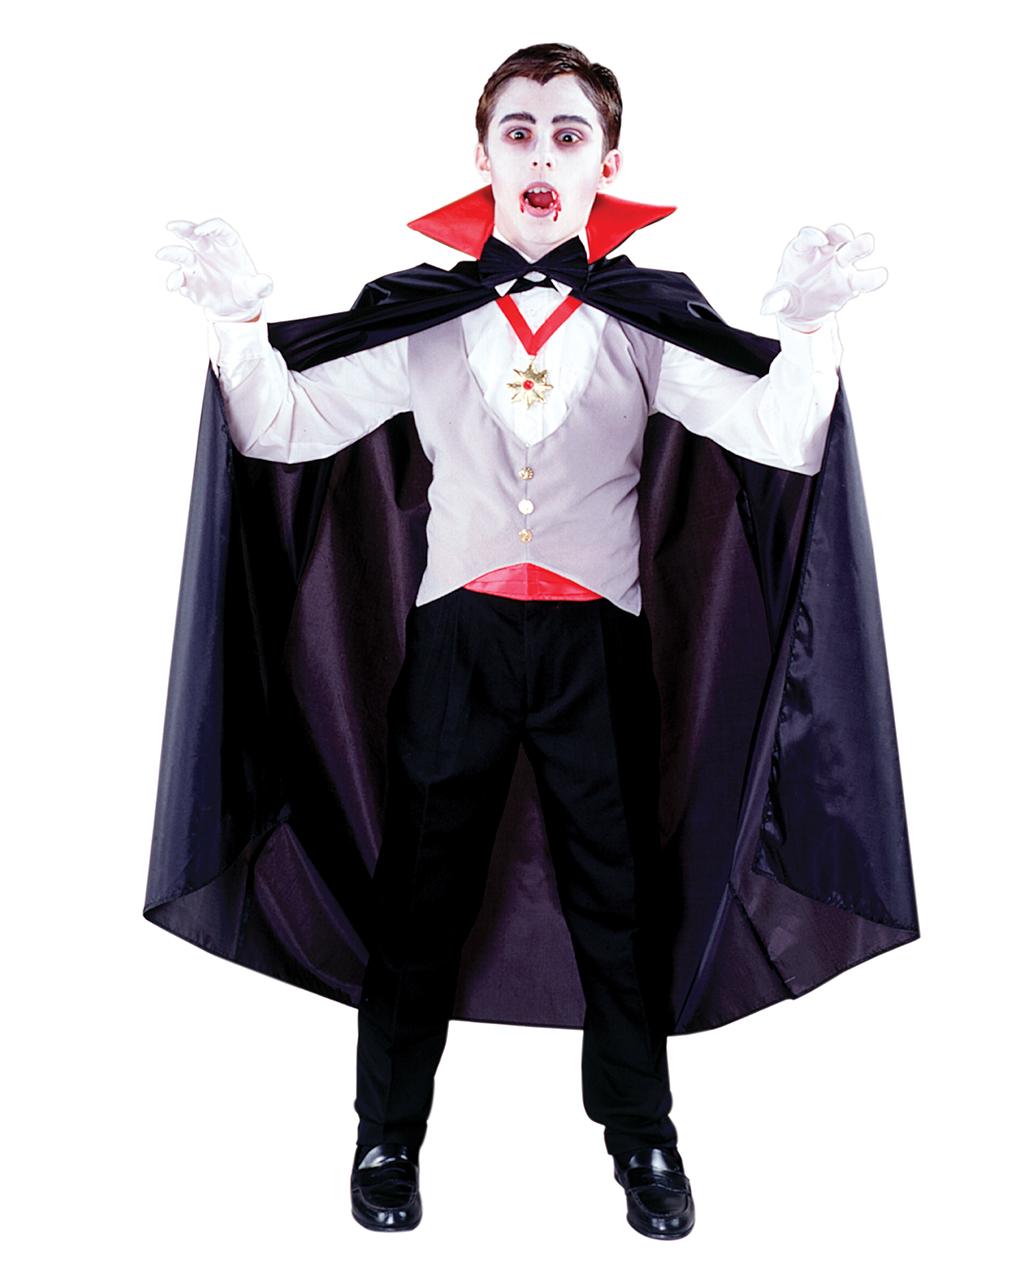 Vampire Child Costume 6 pcs. Vampire costume for children -